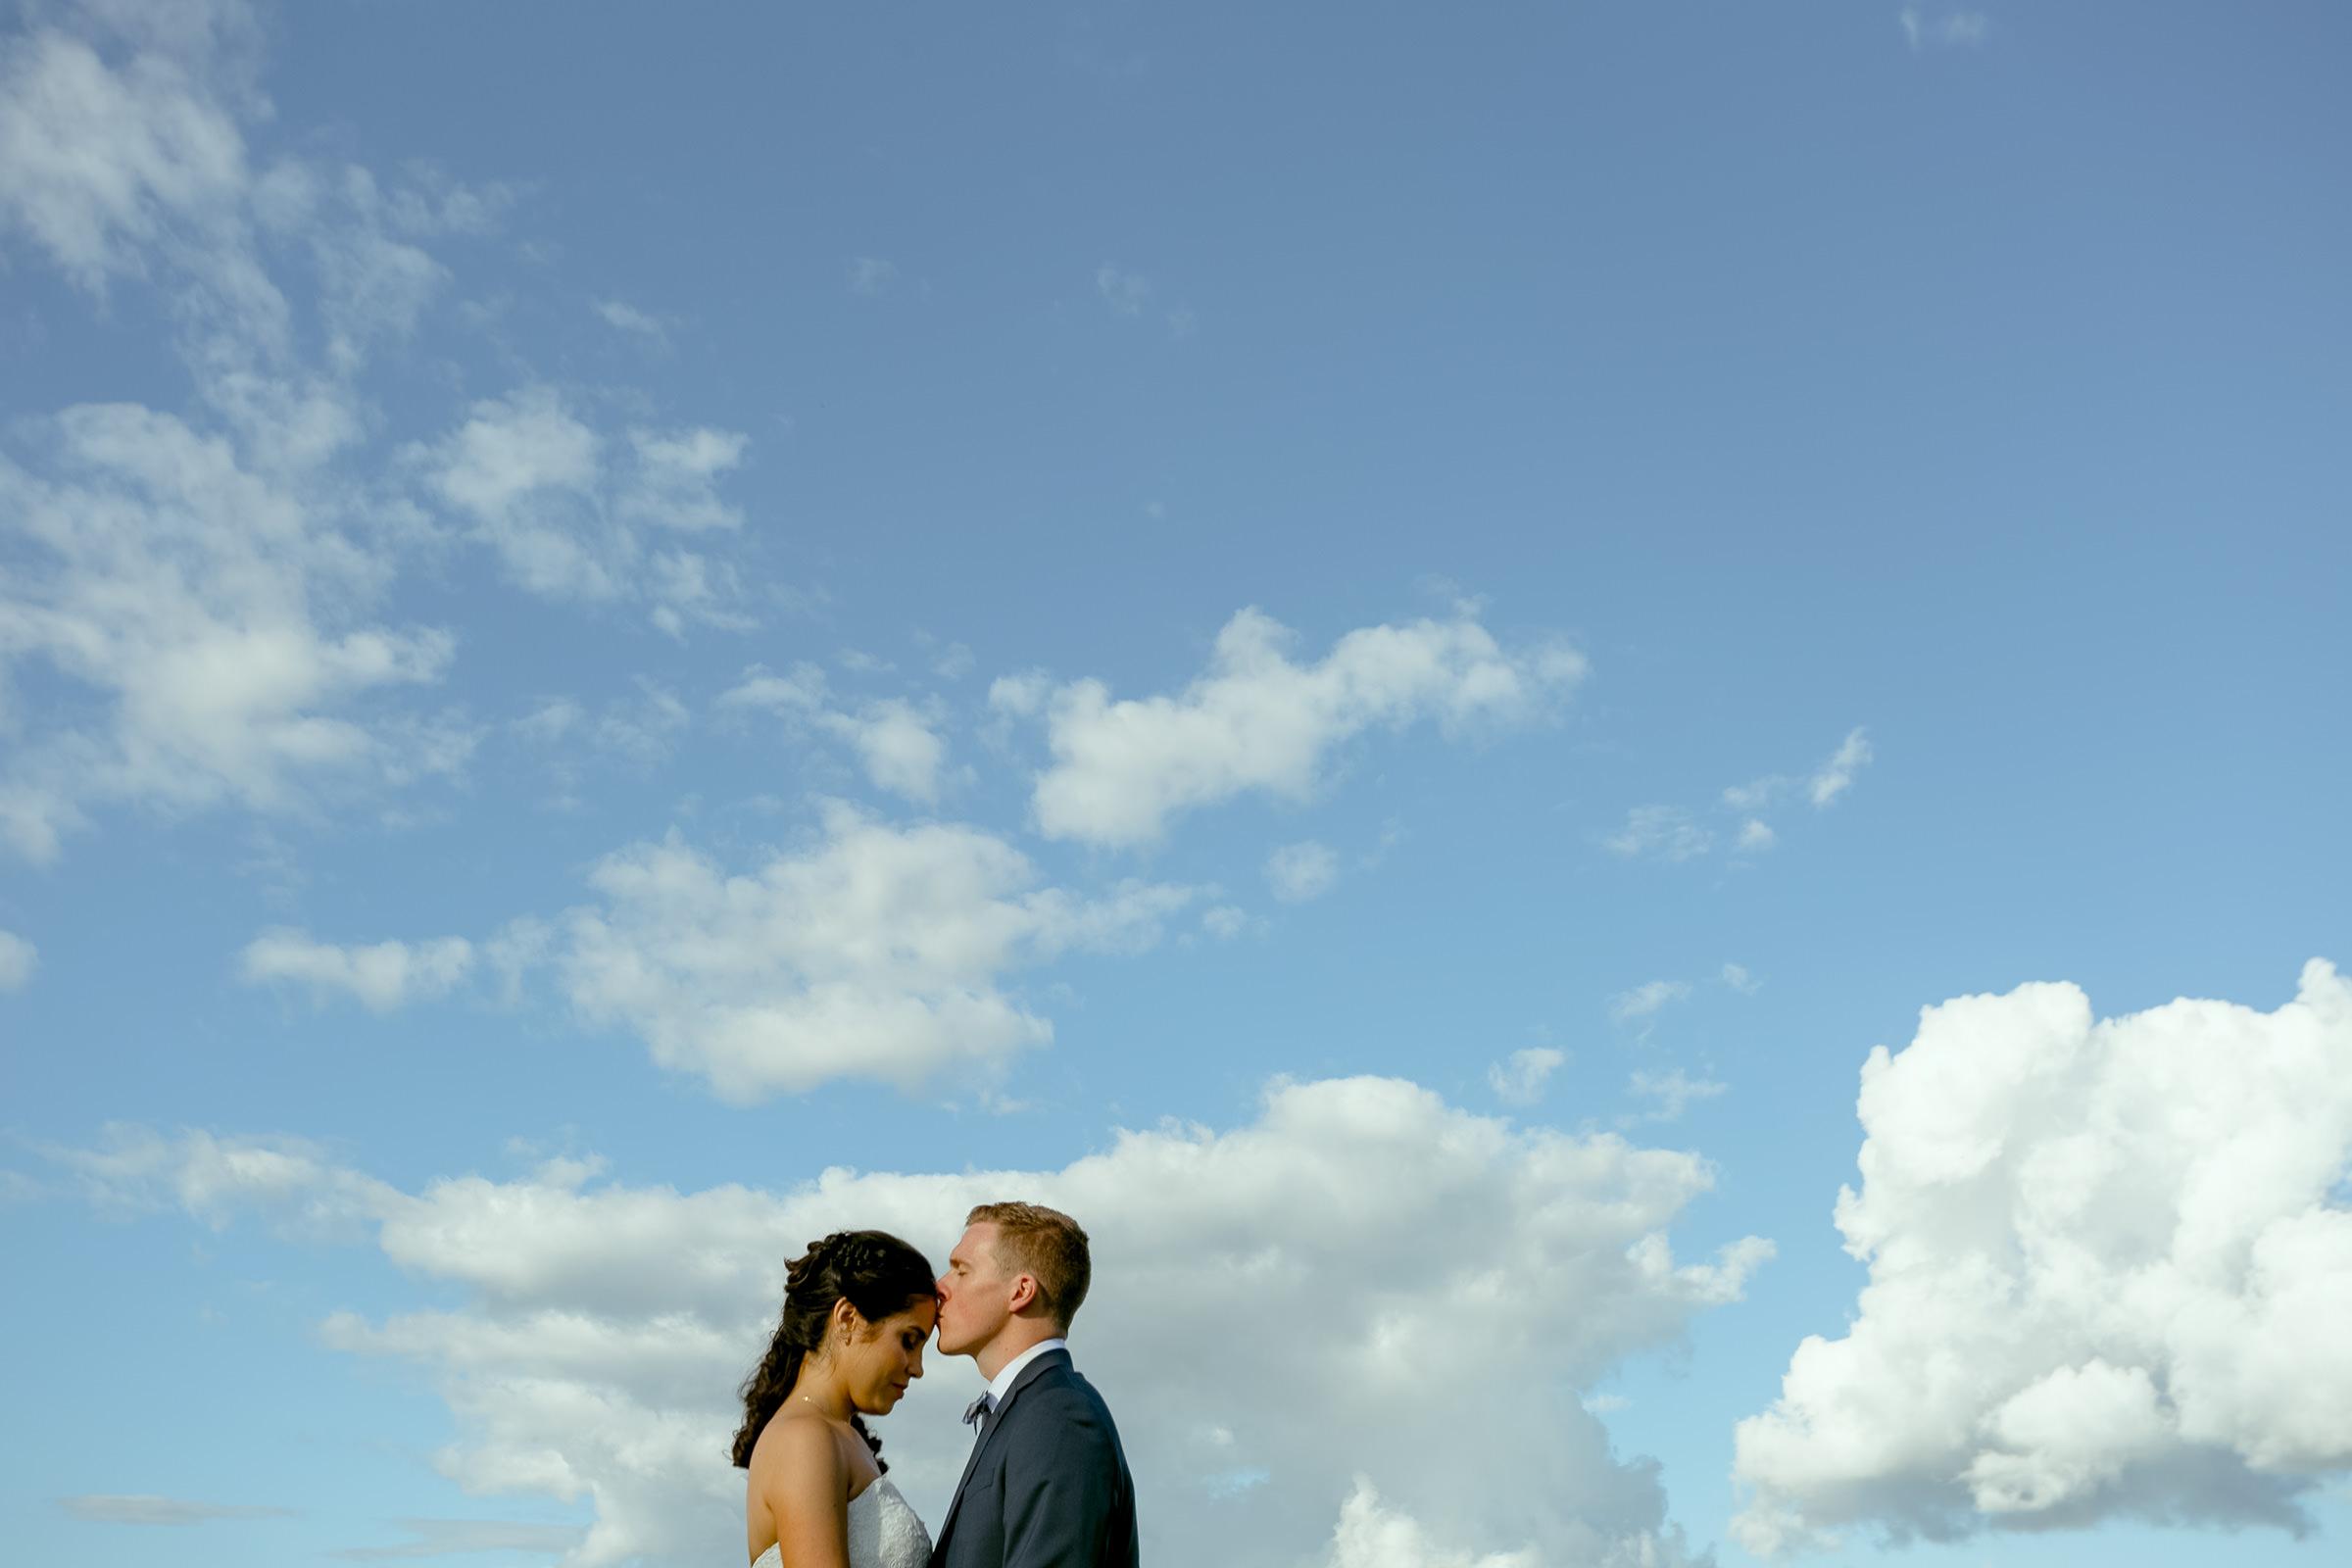 oaxaca-wedding-photographer-02.jpg